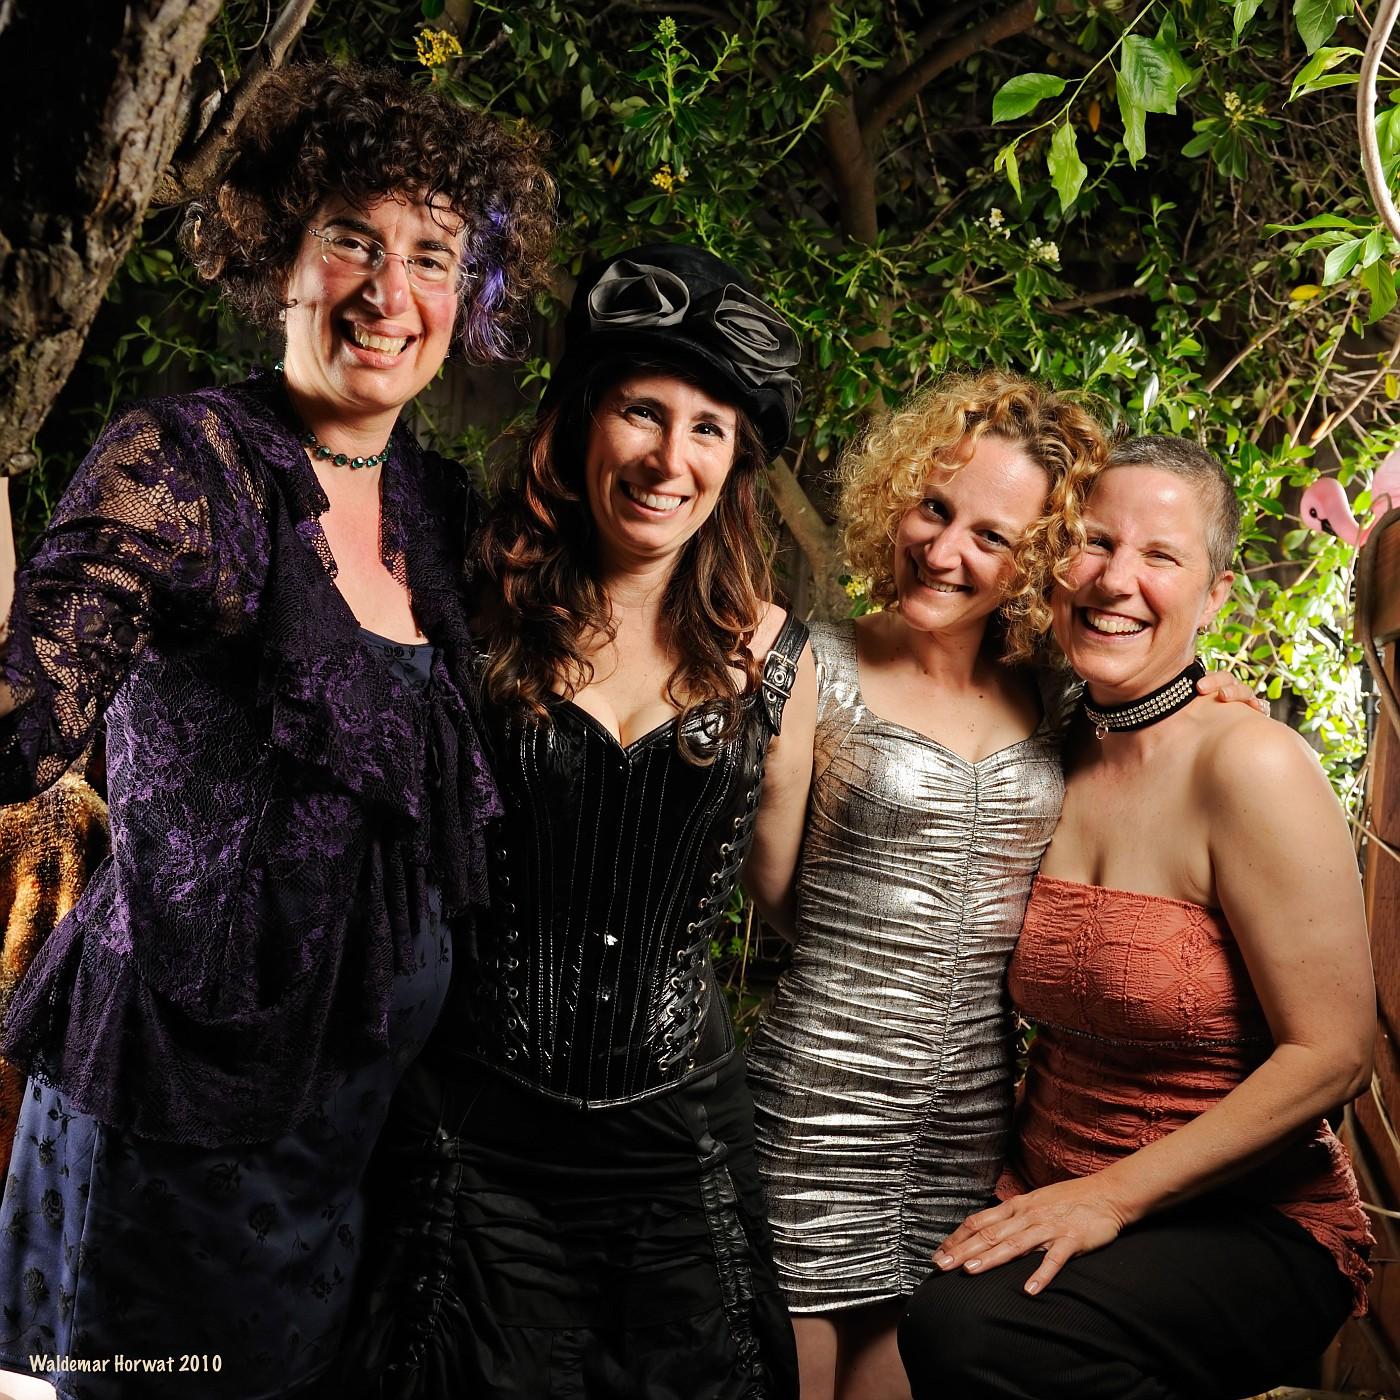 Serafine, Melanie, Mango, and Anabelle